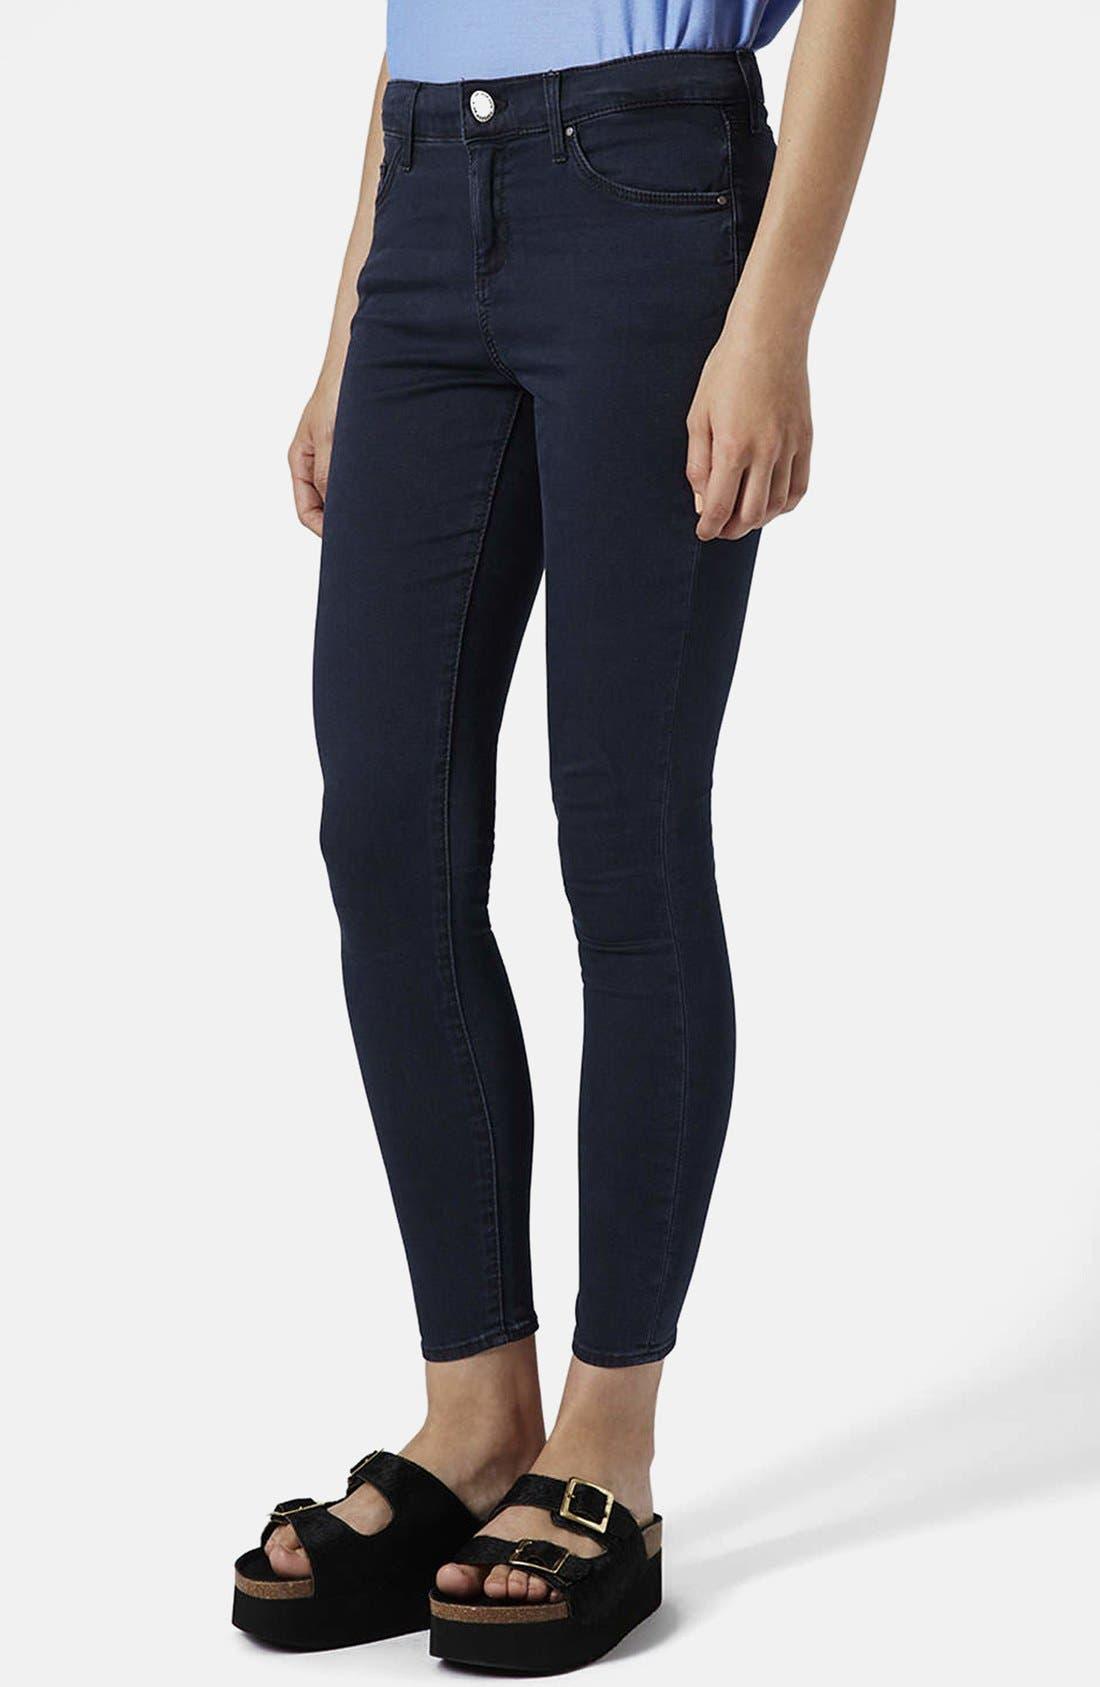 Alternate Image 1 Selected - Topshop Moto 'Leigh' Crop Skinny Jeans (Blue Black) (Regular, Short & Long)